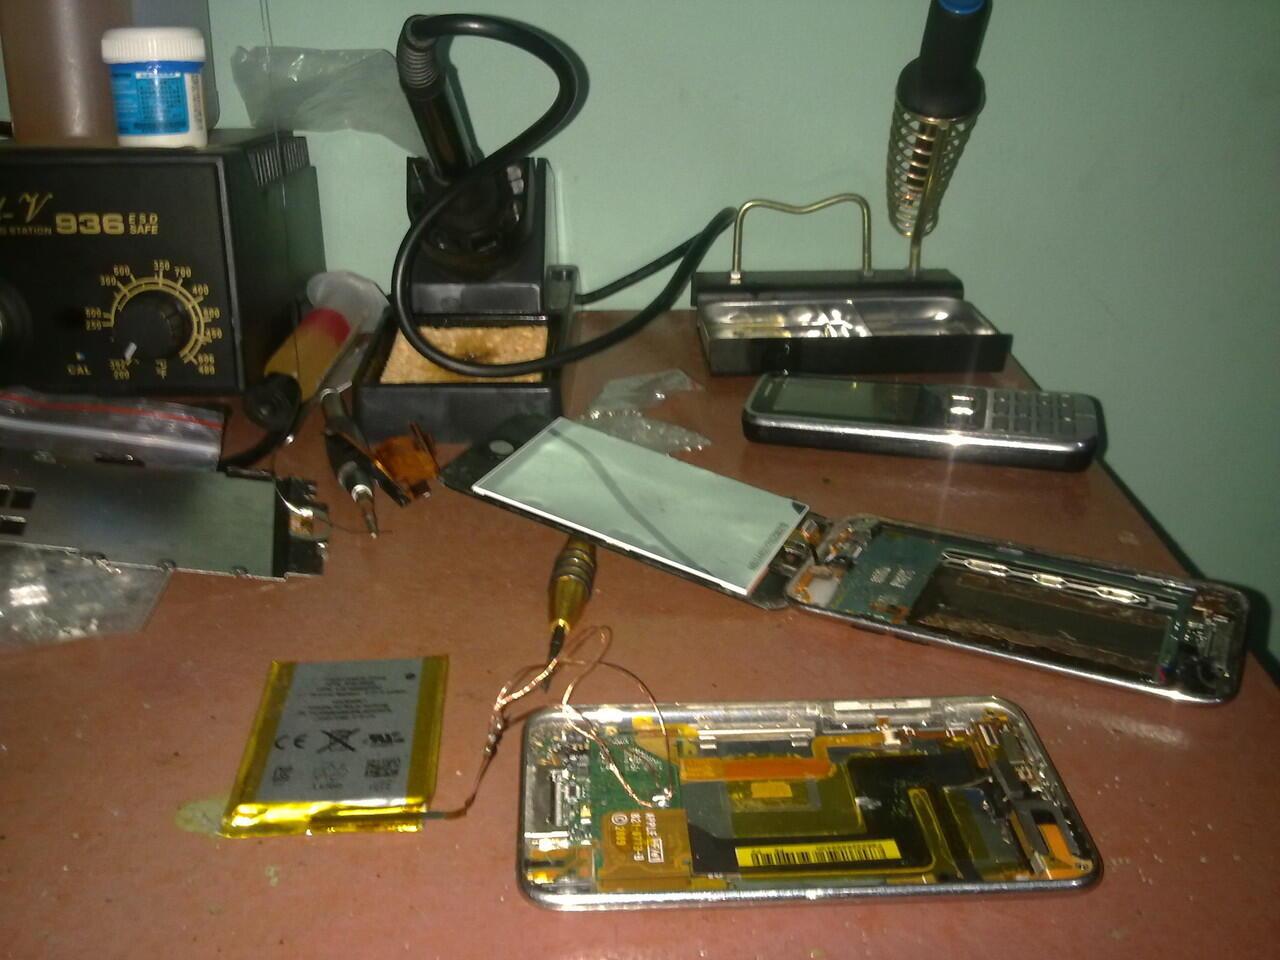 Terjual Bettery Batre Ipod Touch 234 Generation Kaskus Baterai 5